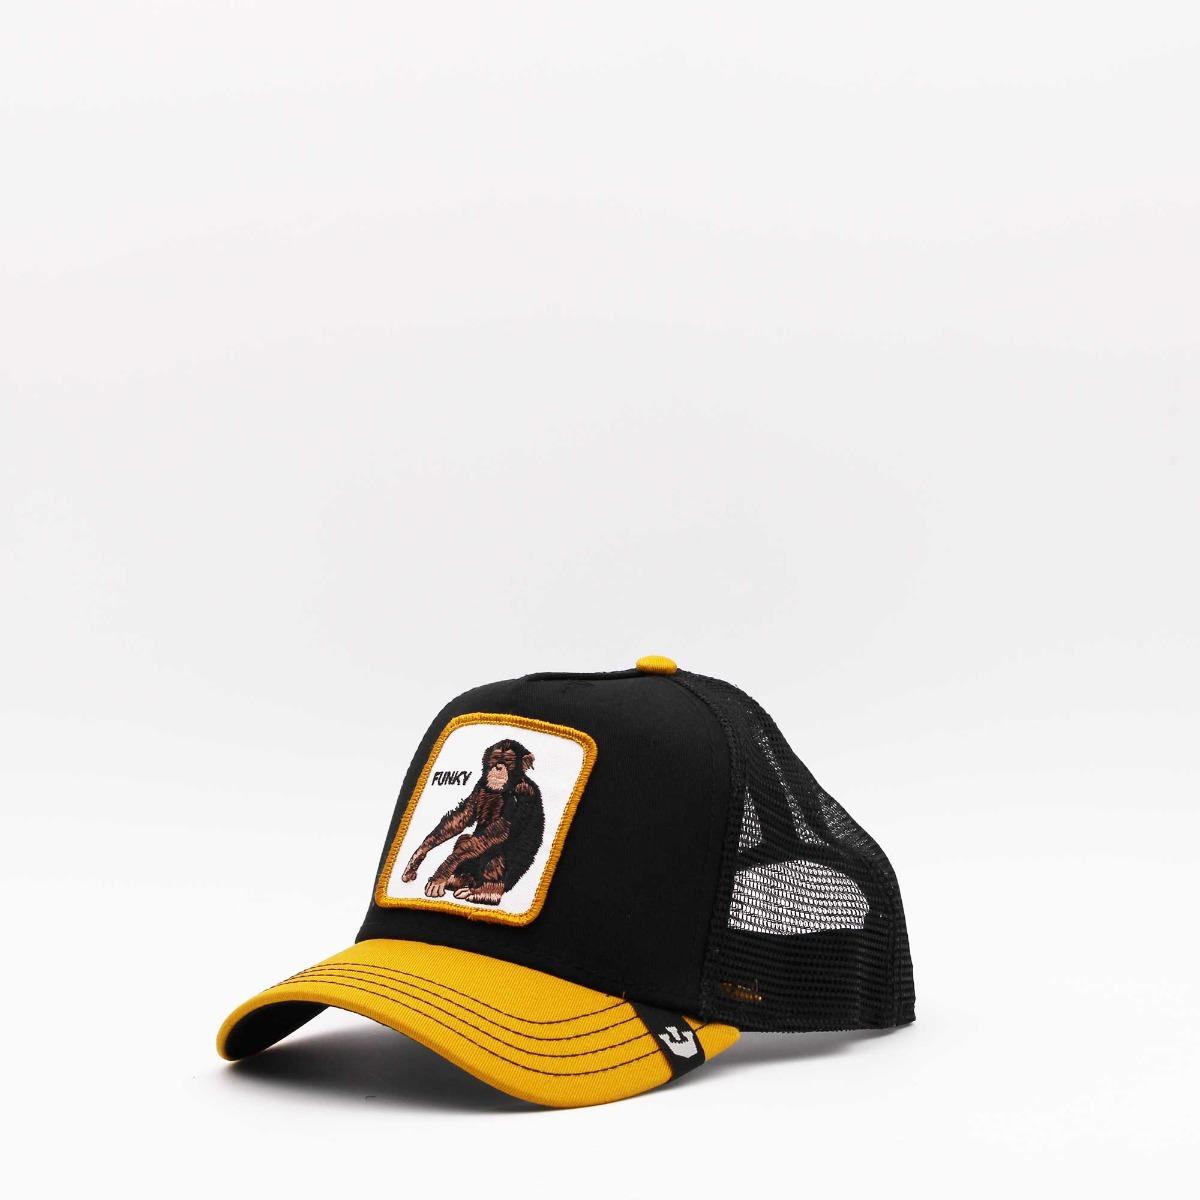 Baseball funky - Nero/giallo